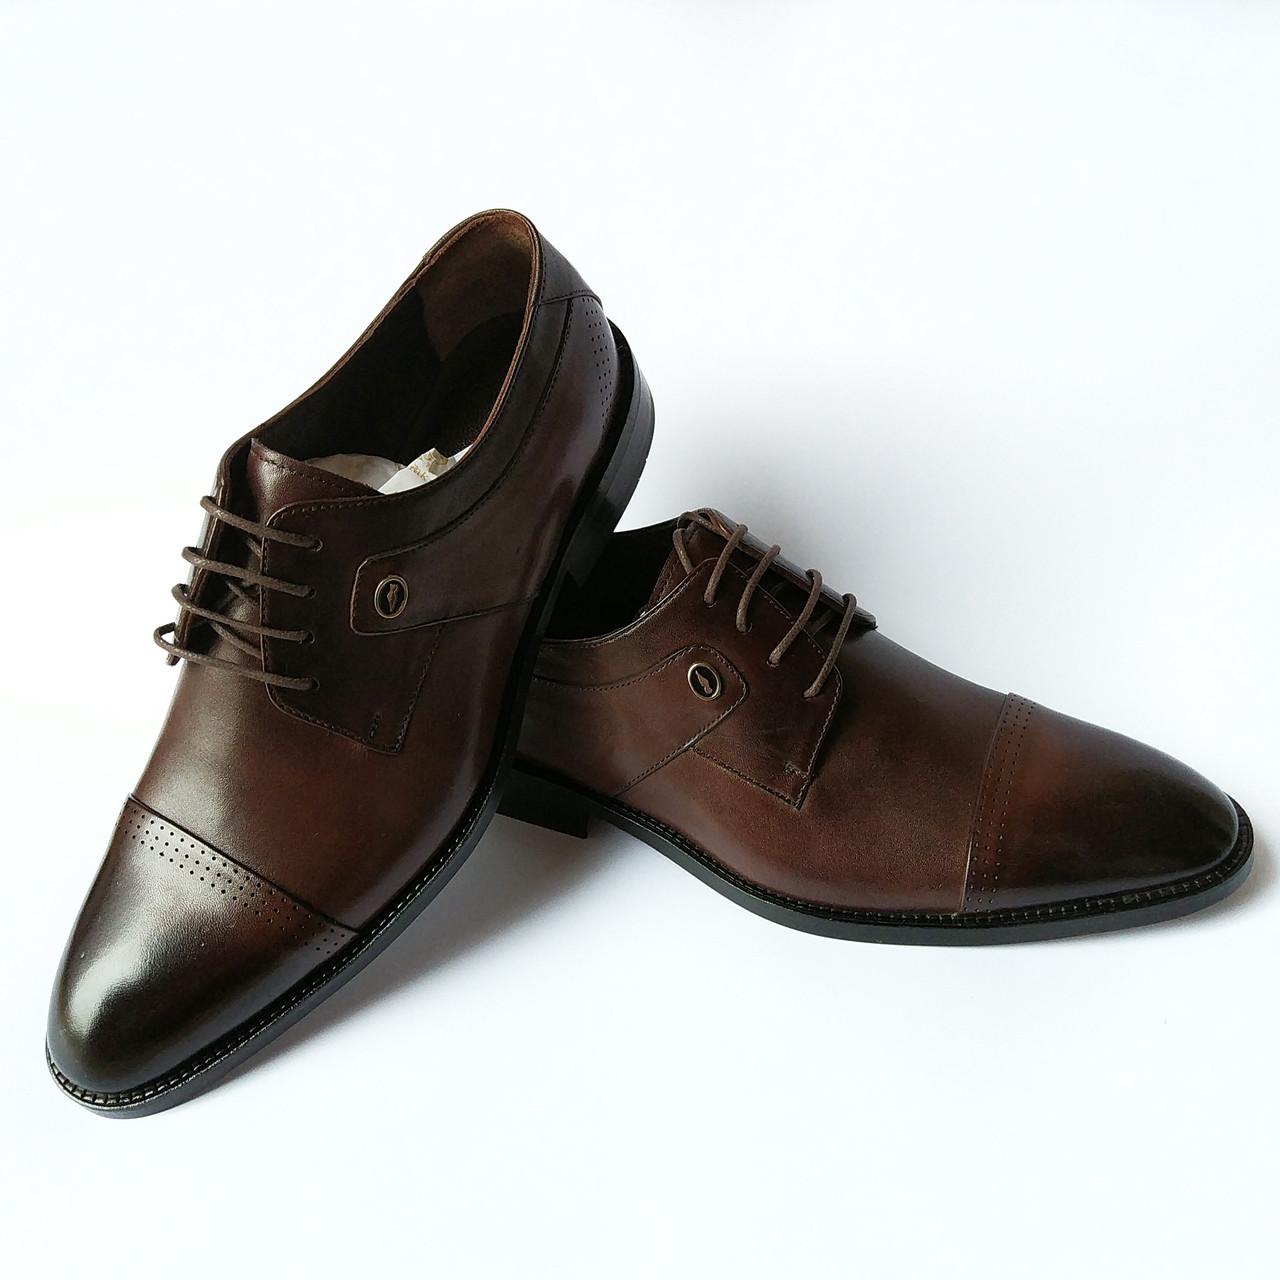 8120f3e9e Шоколадные туфли на шнурках Турция - Интернет-магазин